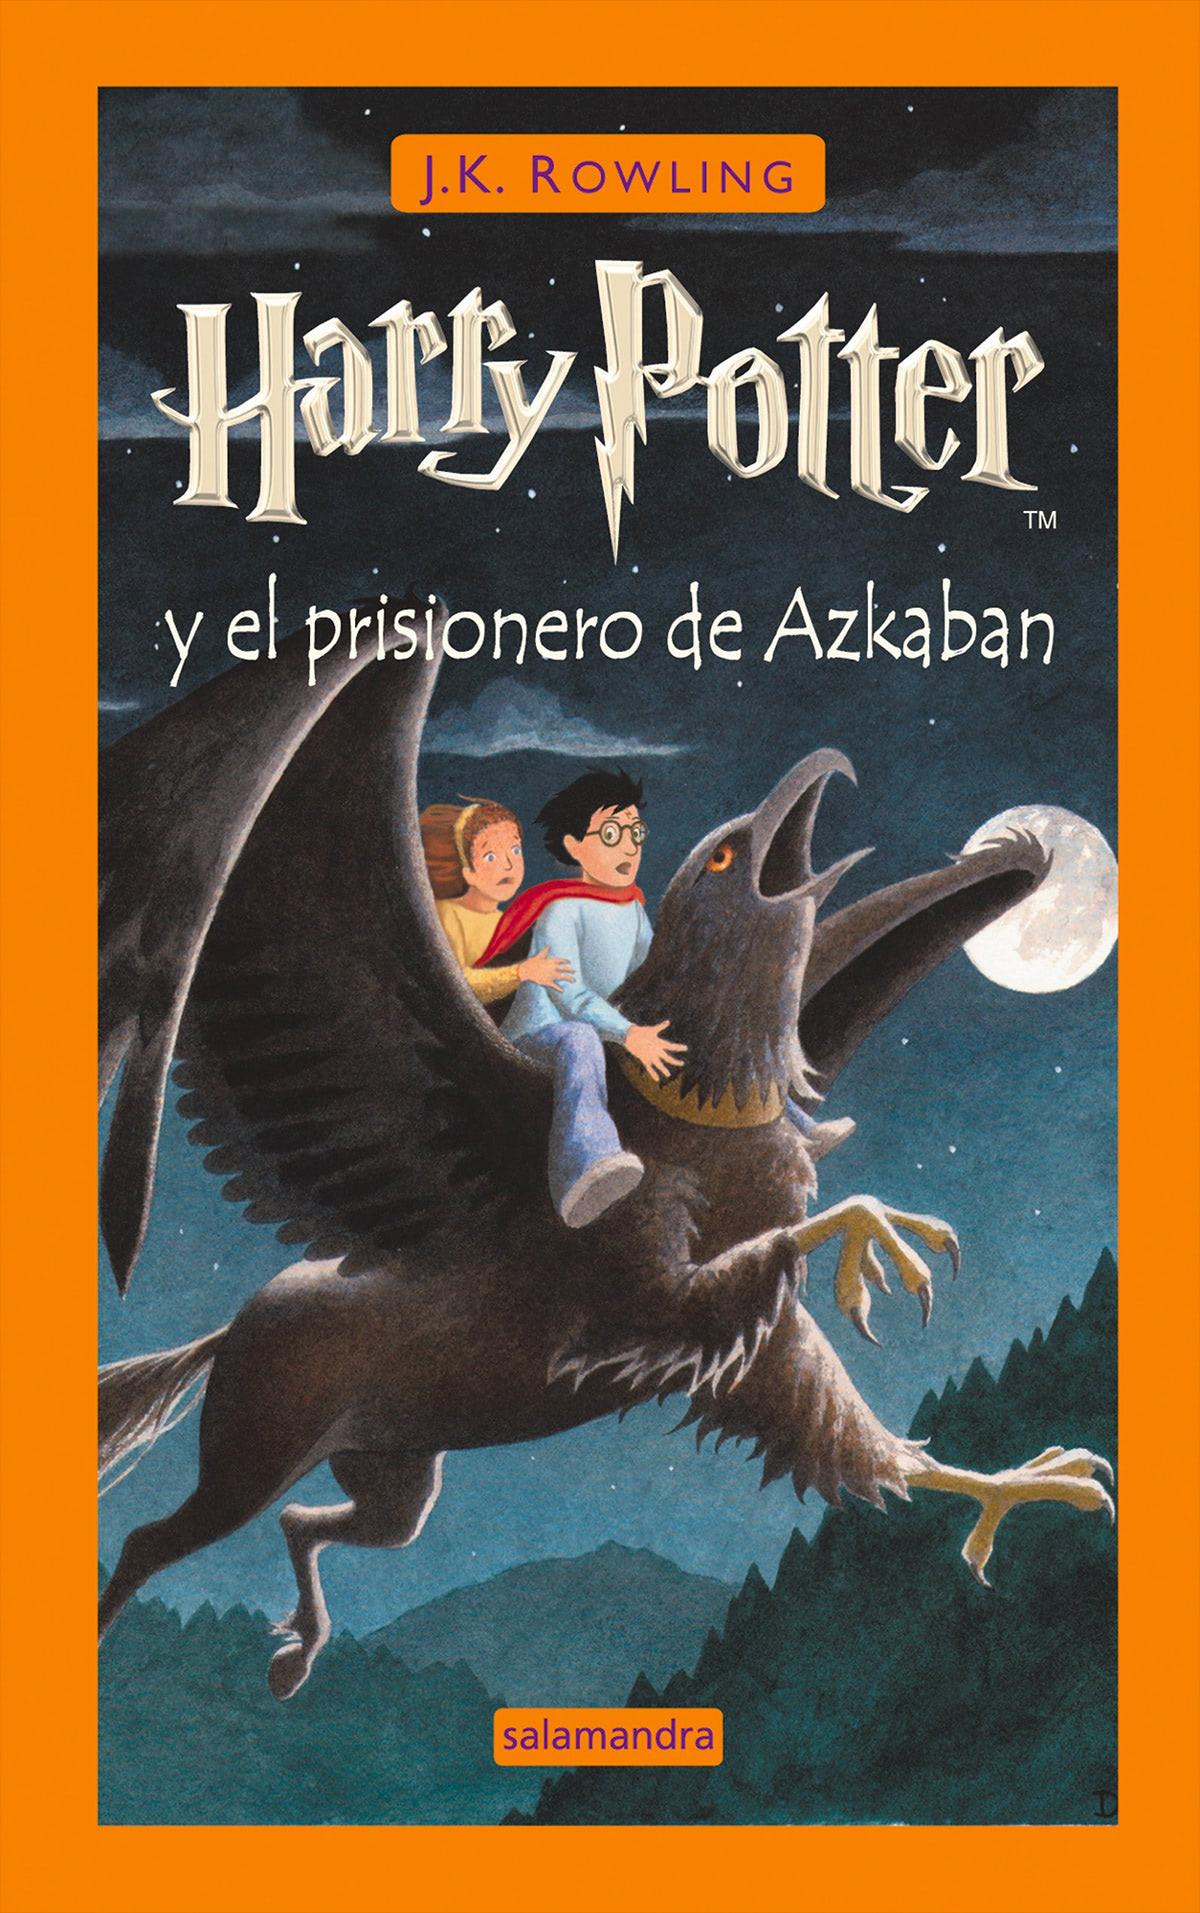 'Prisoner of Azkaban' Spanish edition